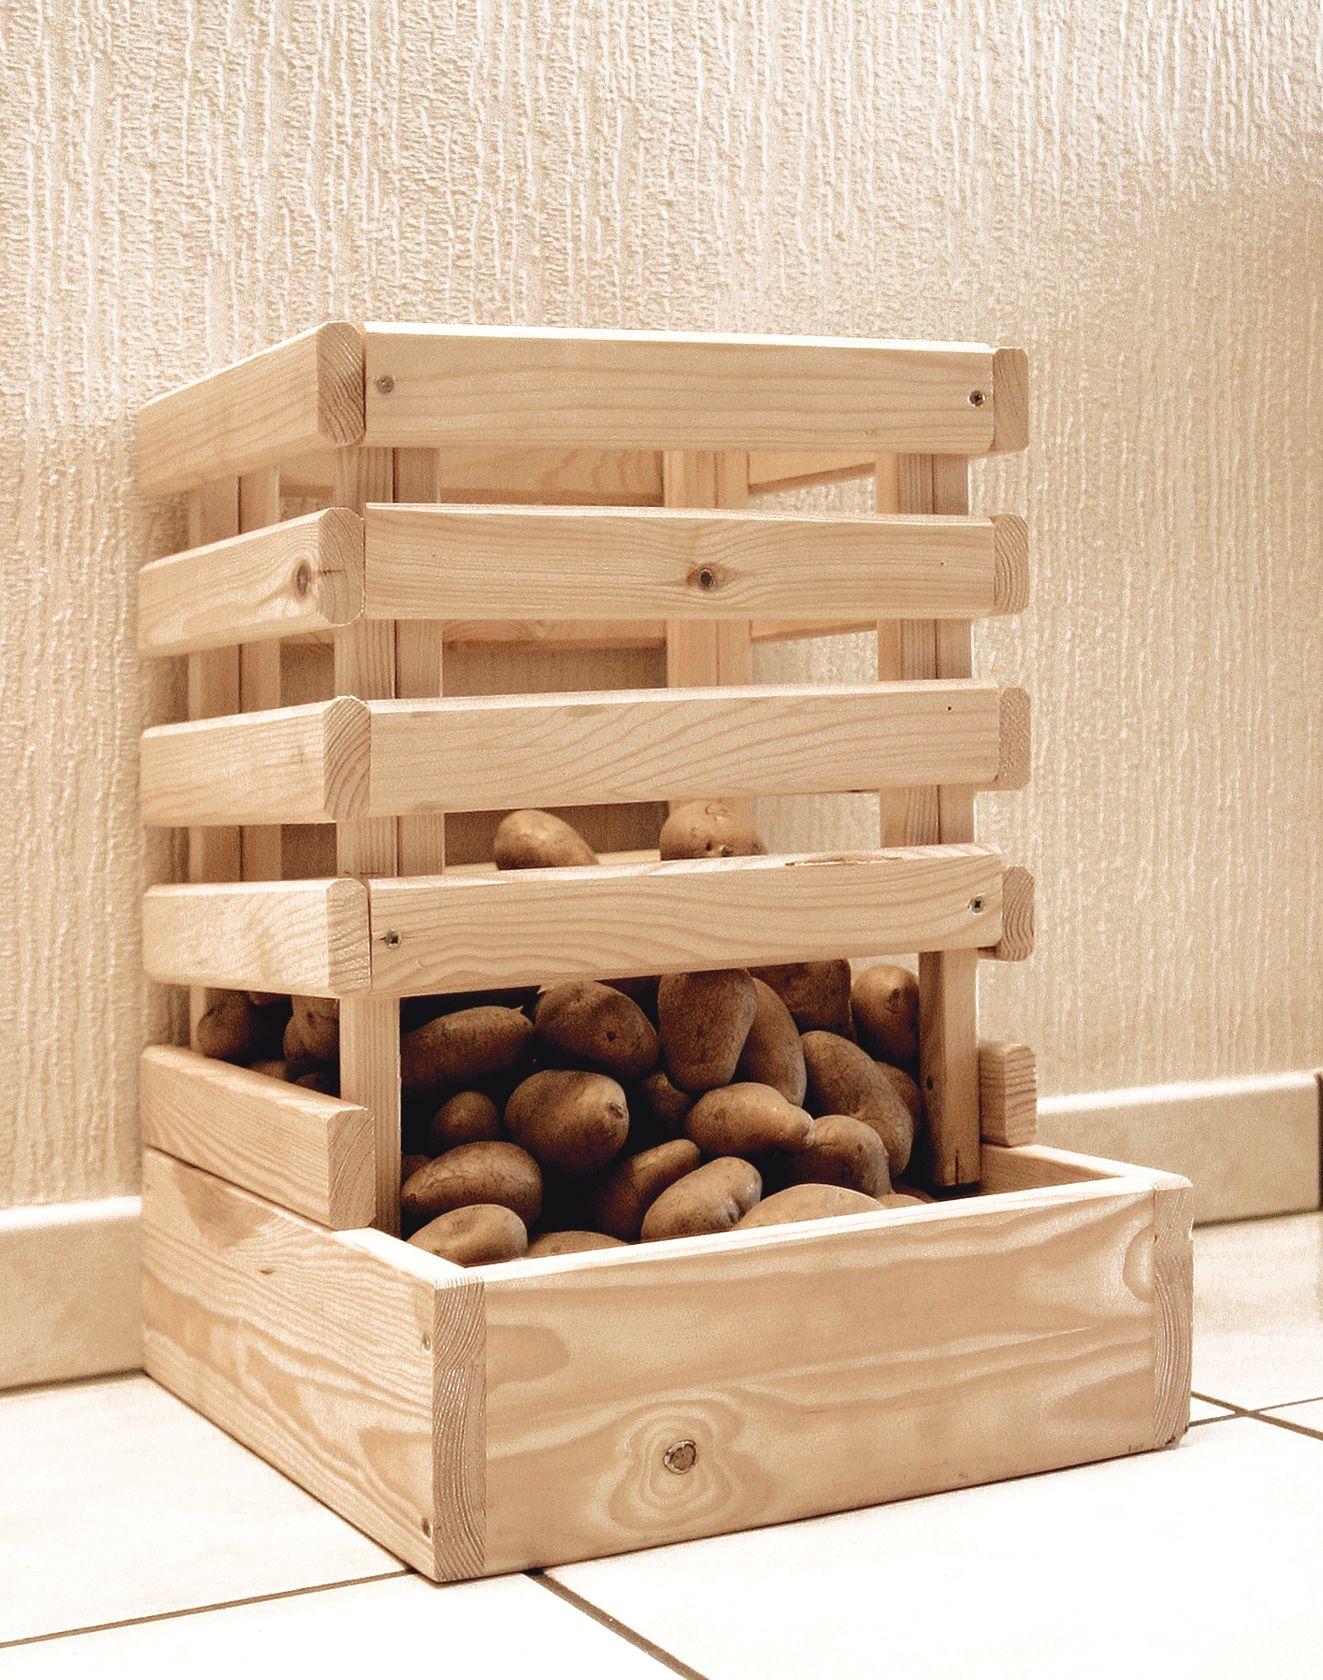 kartoffelkiste ca 30 x 42 x 46 5 cm permakultur pinterest apfelkiste obstkisten und. Black Bedroom Furniture Sets. Home Design Ideas